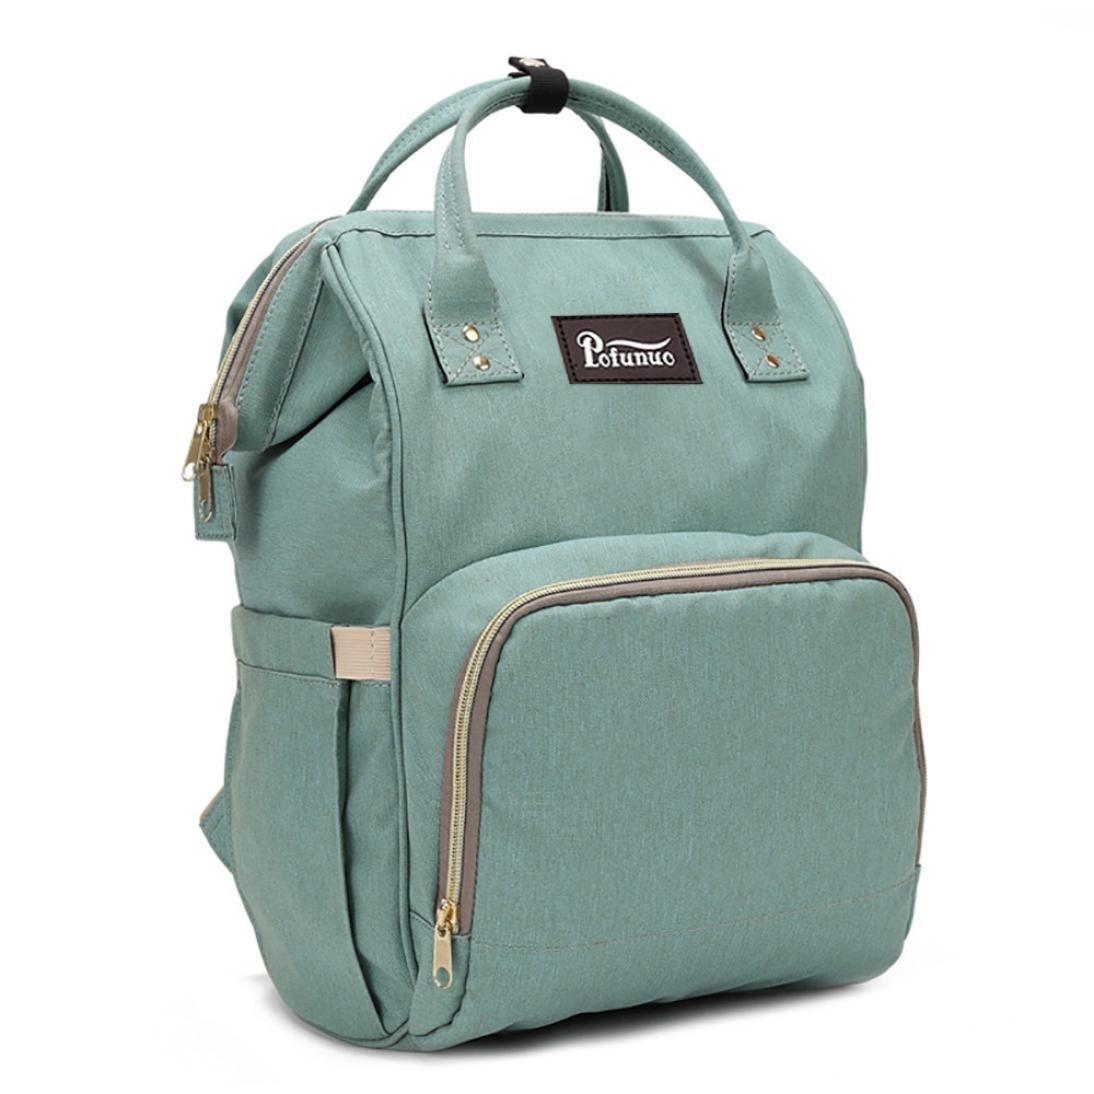 Liraly Mummy Bag Nappy Bag Large Capacity Baby Bag Travel Backpack Desiger Nursing Bag (Mint Green)